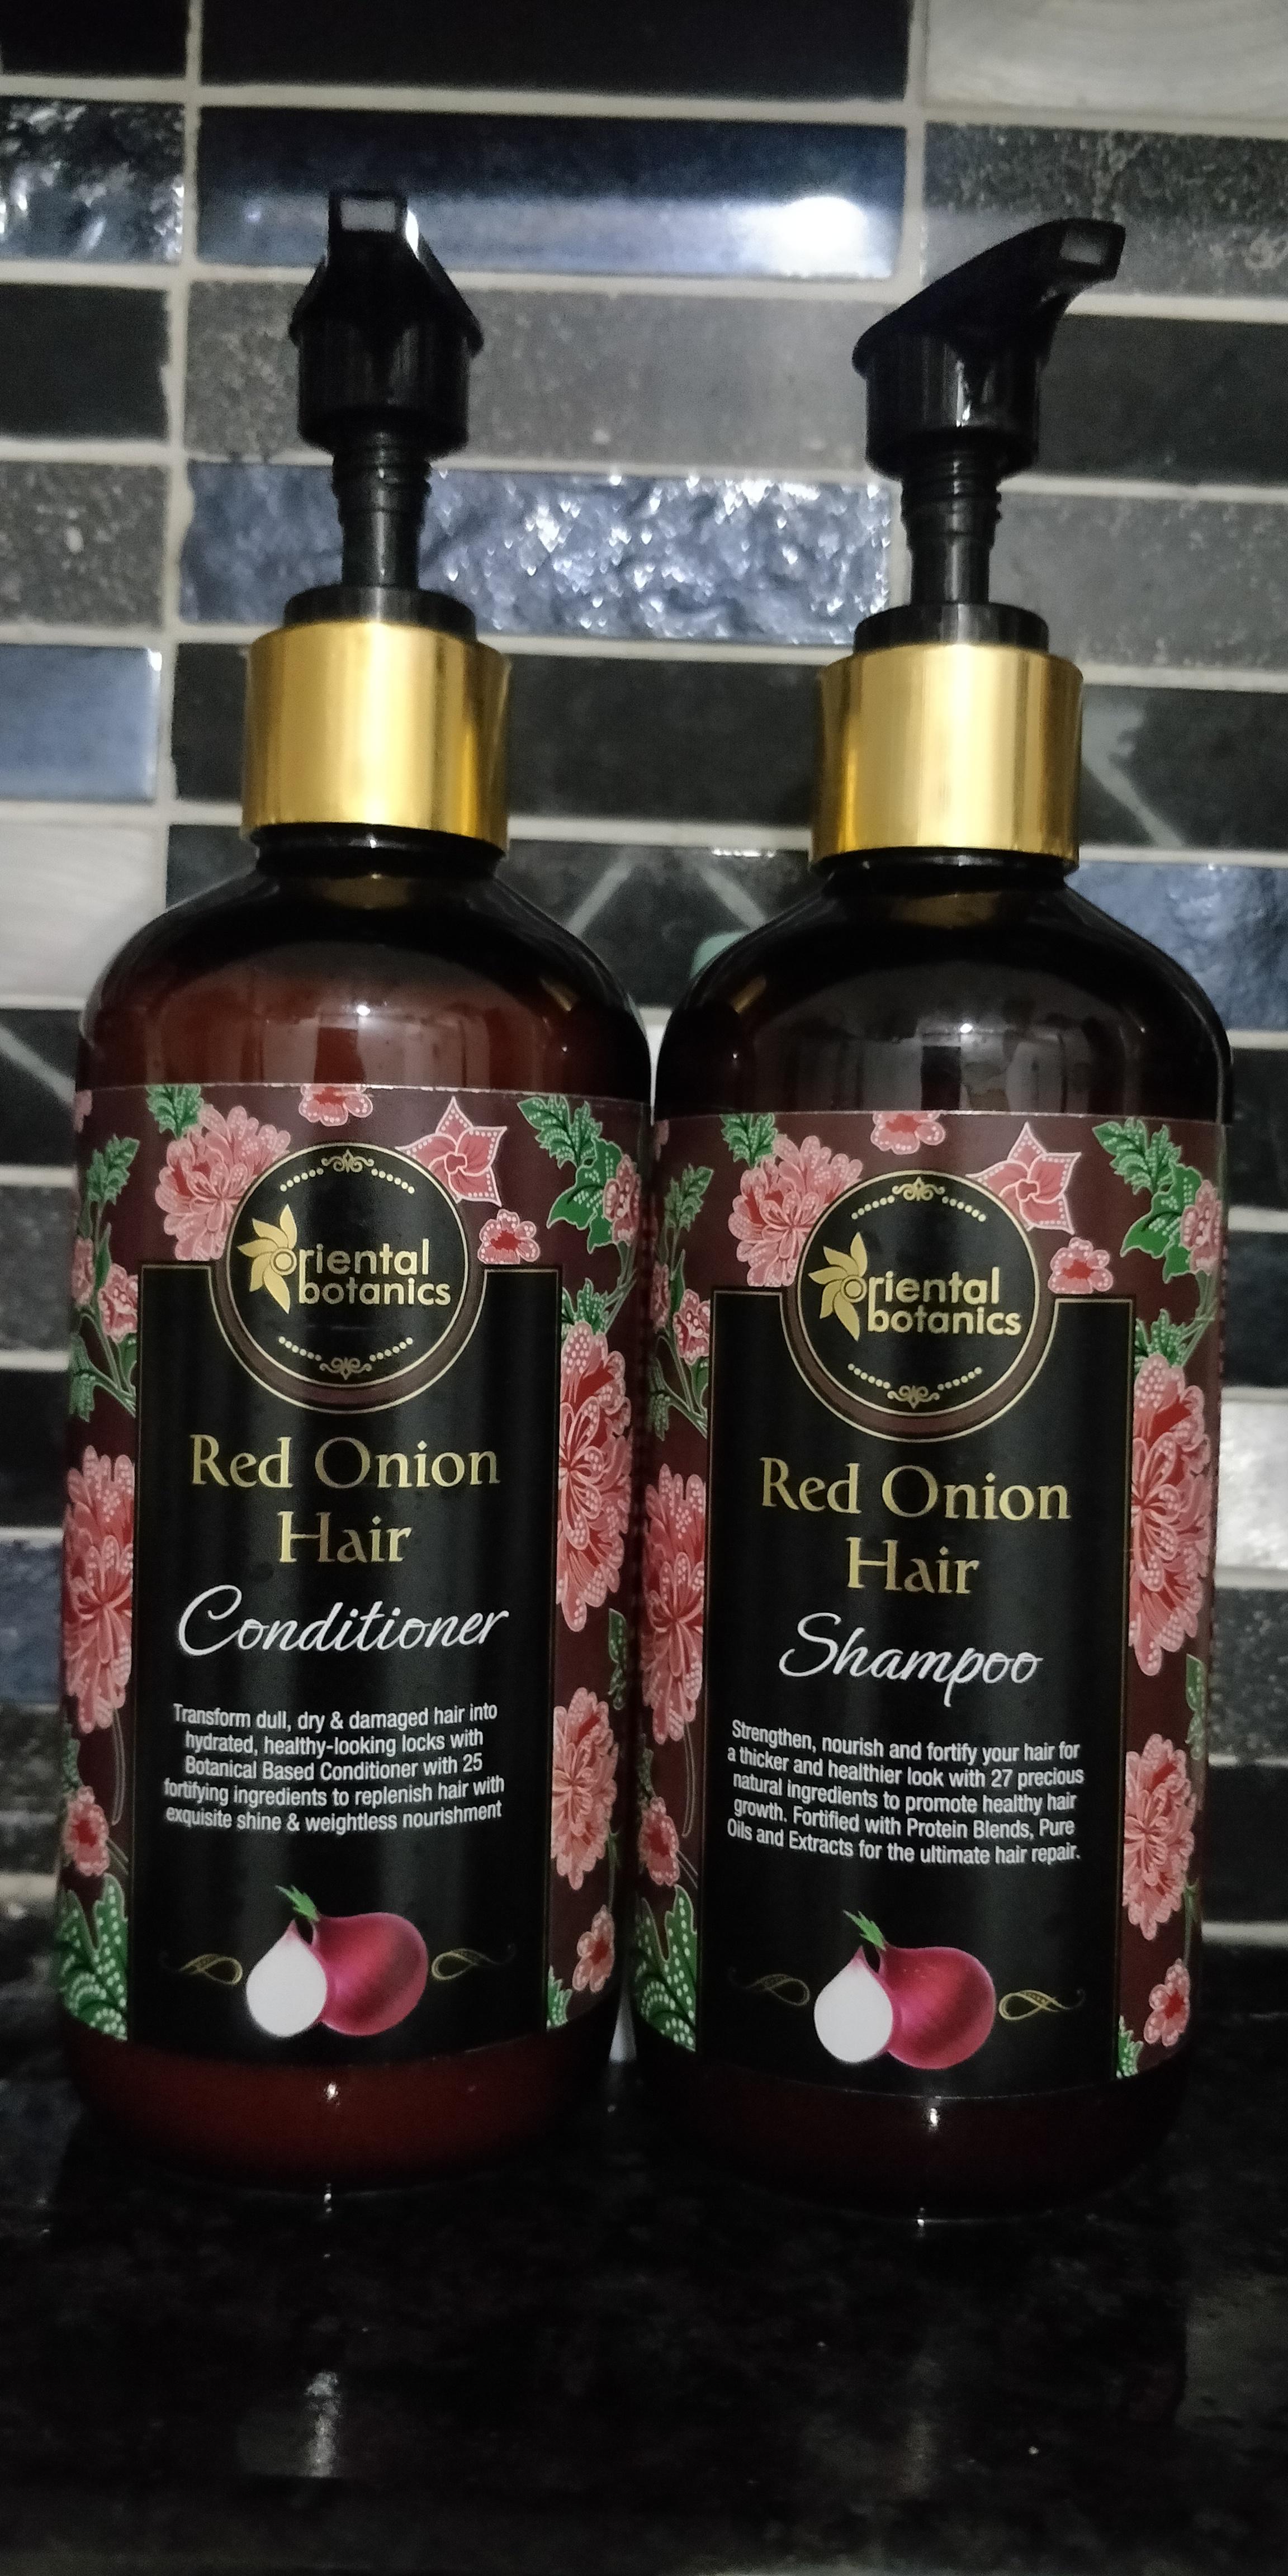 Oriental Botanics Red Onion Hair Shampoo + Conditioner Kit-Dandruff Hairfall Expert-By shriya_saxena